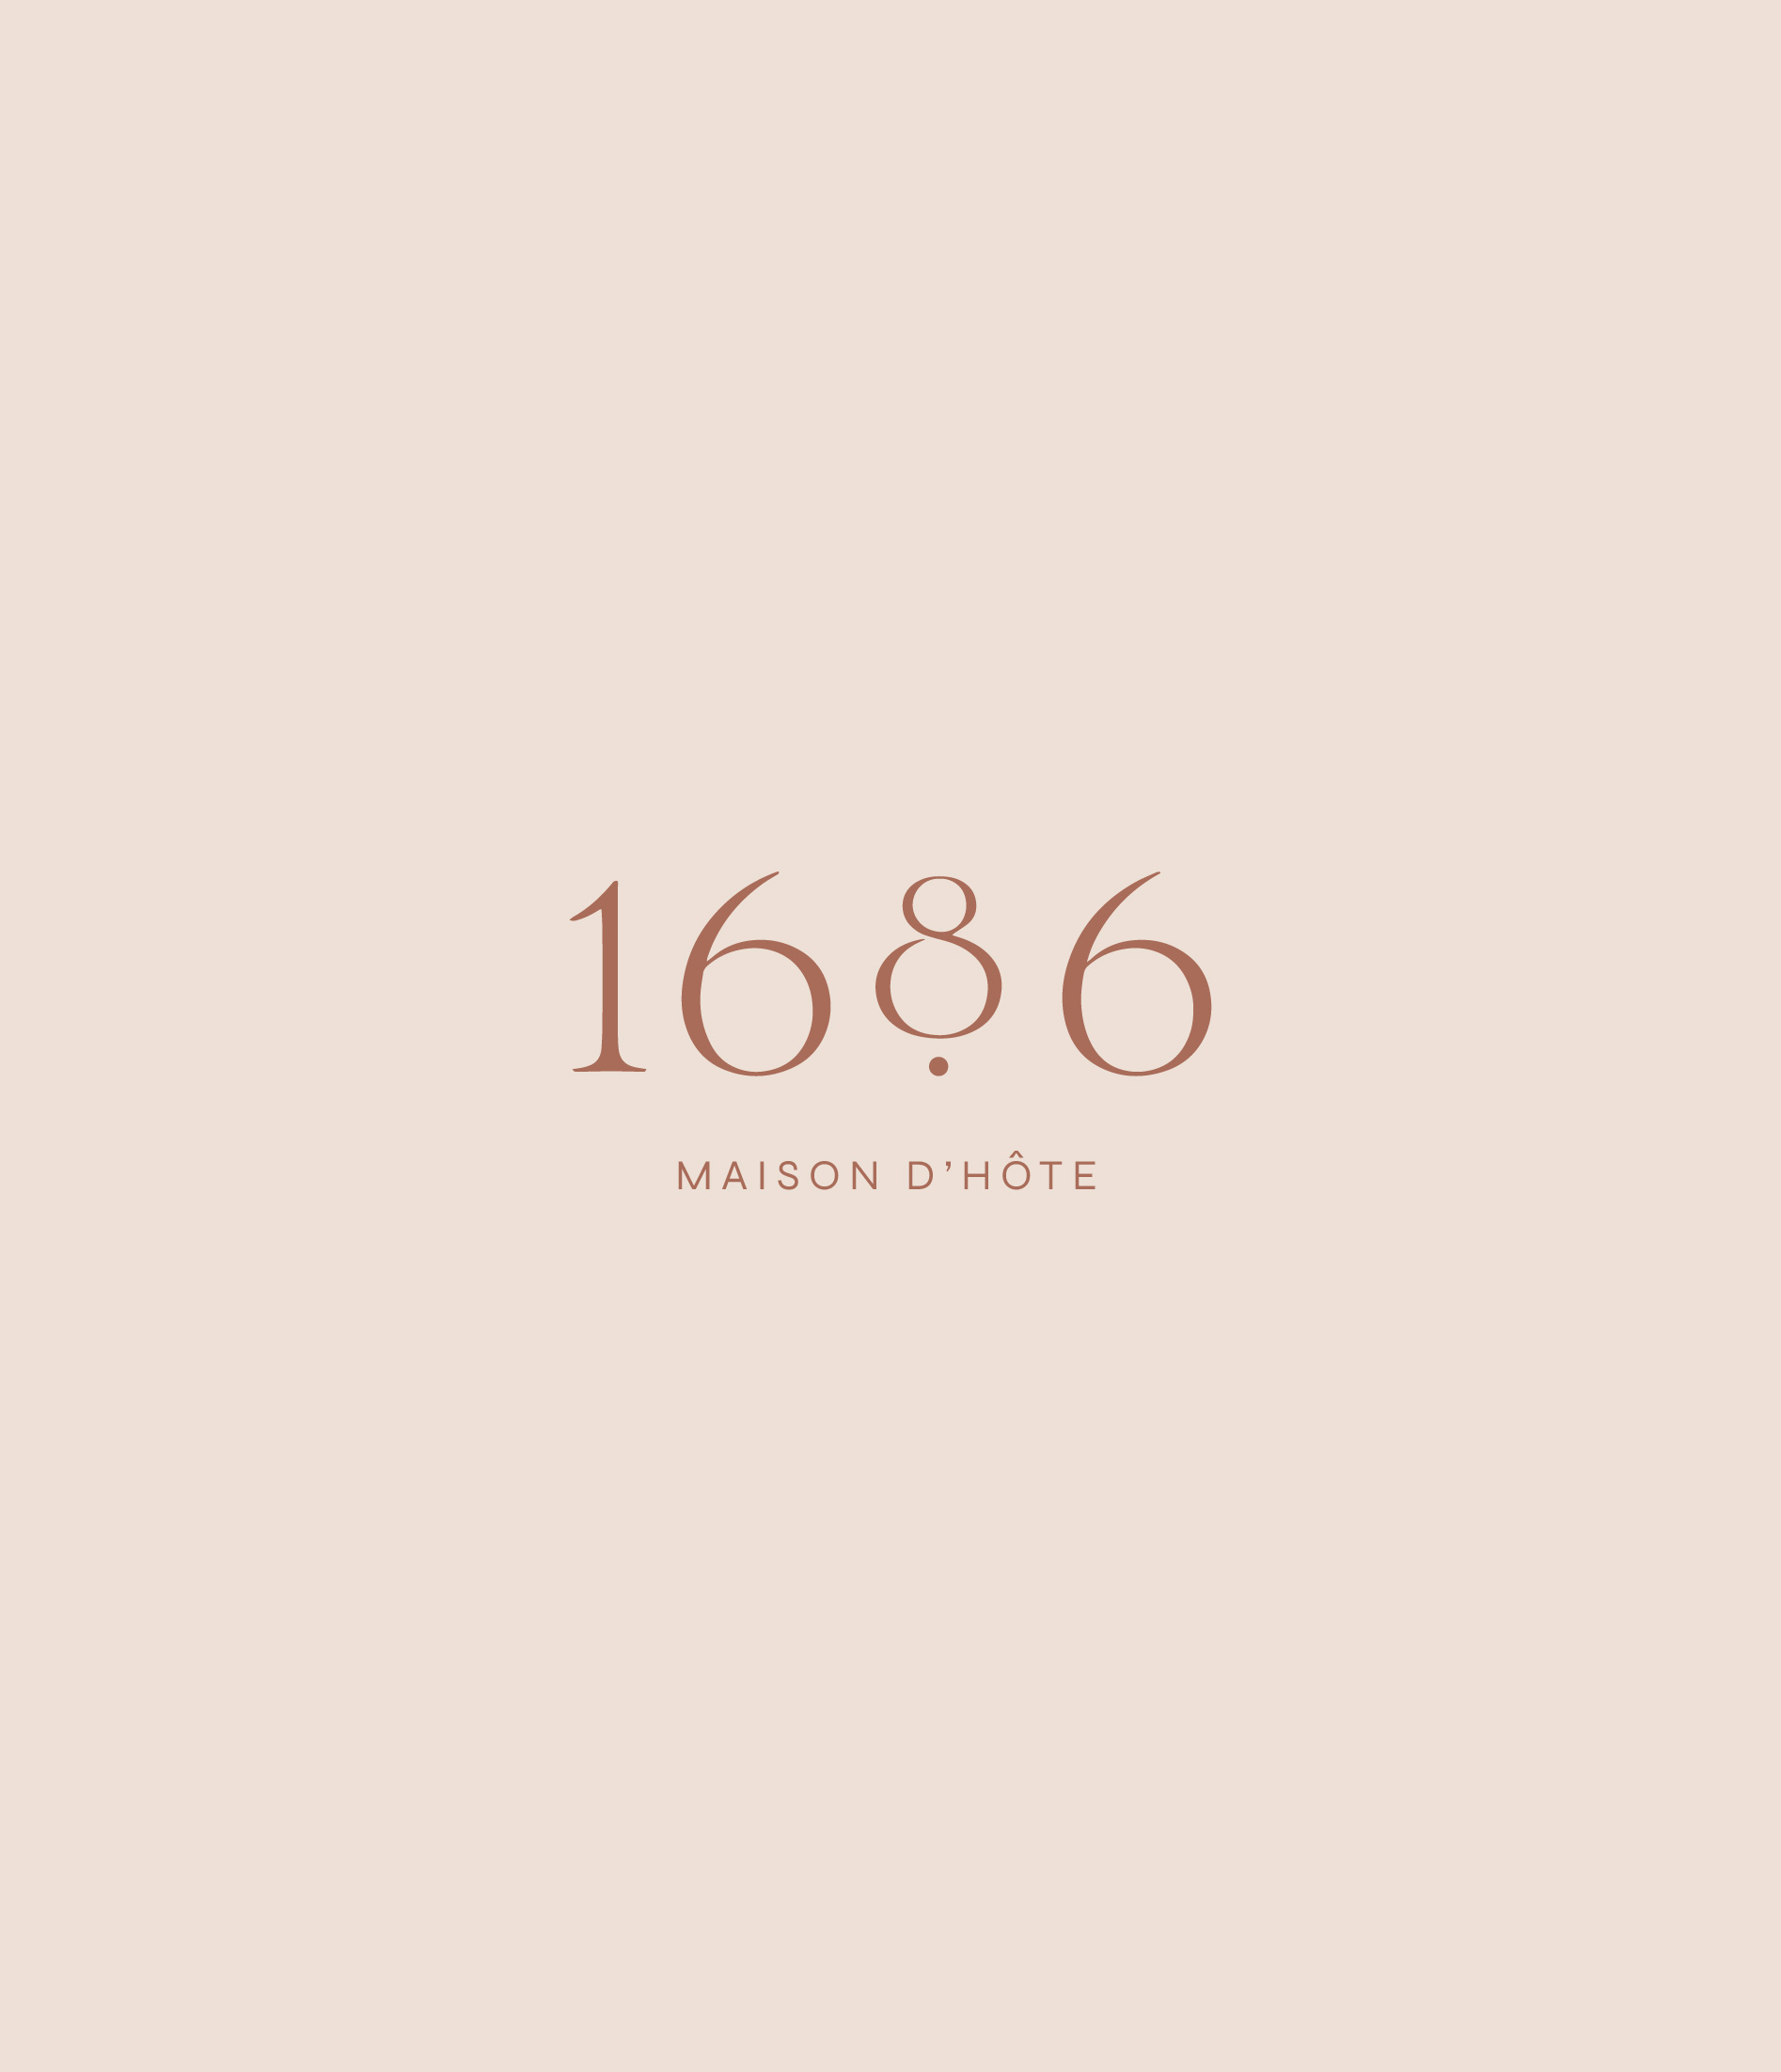 1686 - logo principal en terracota sur fond beige/rose